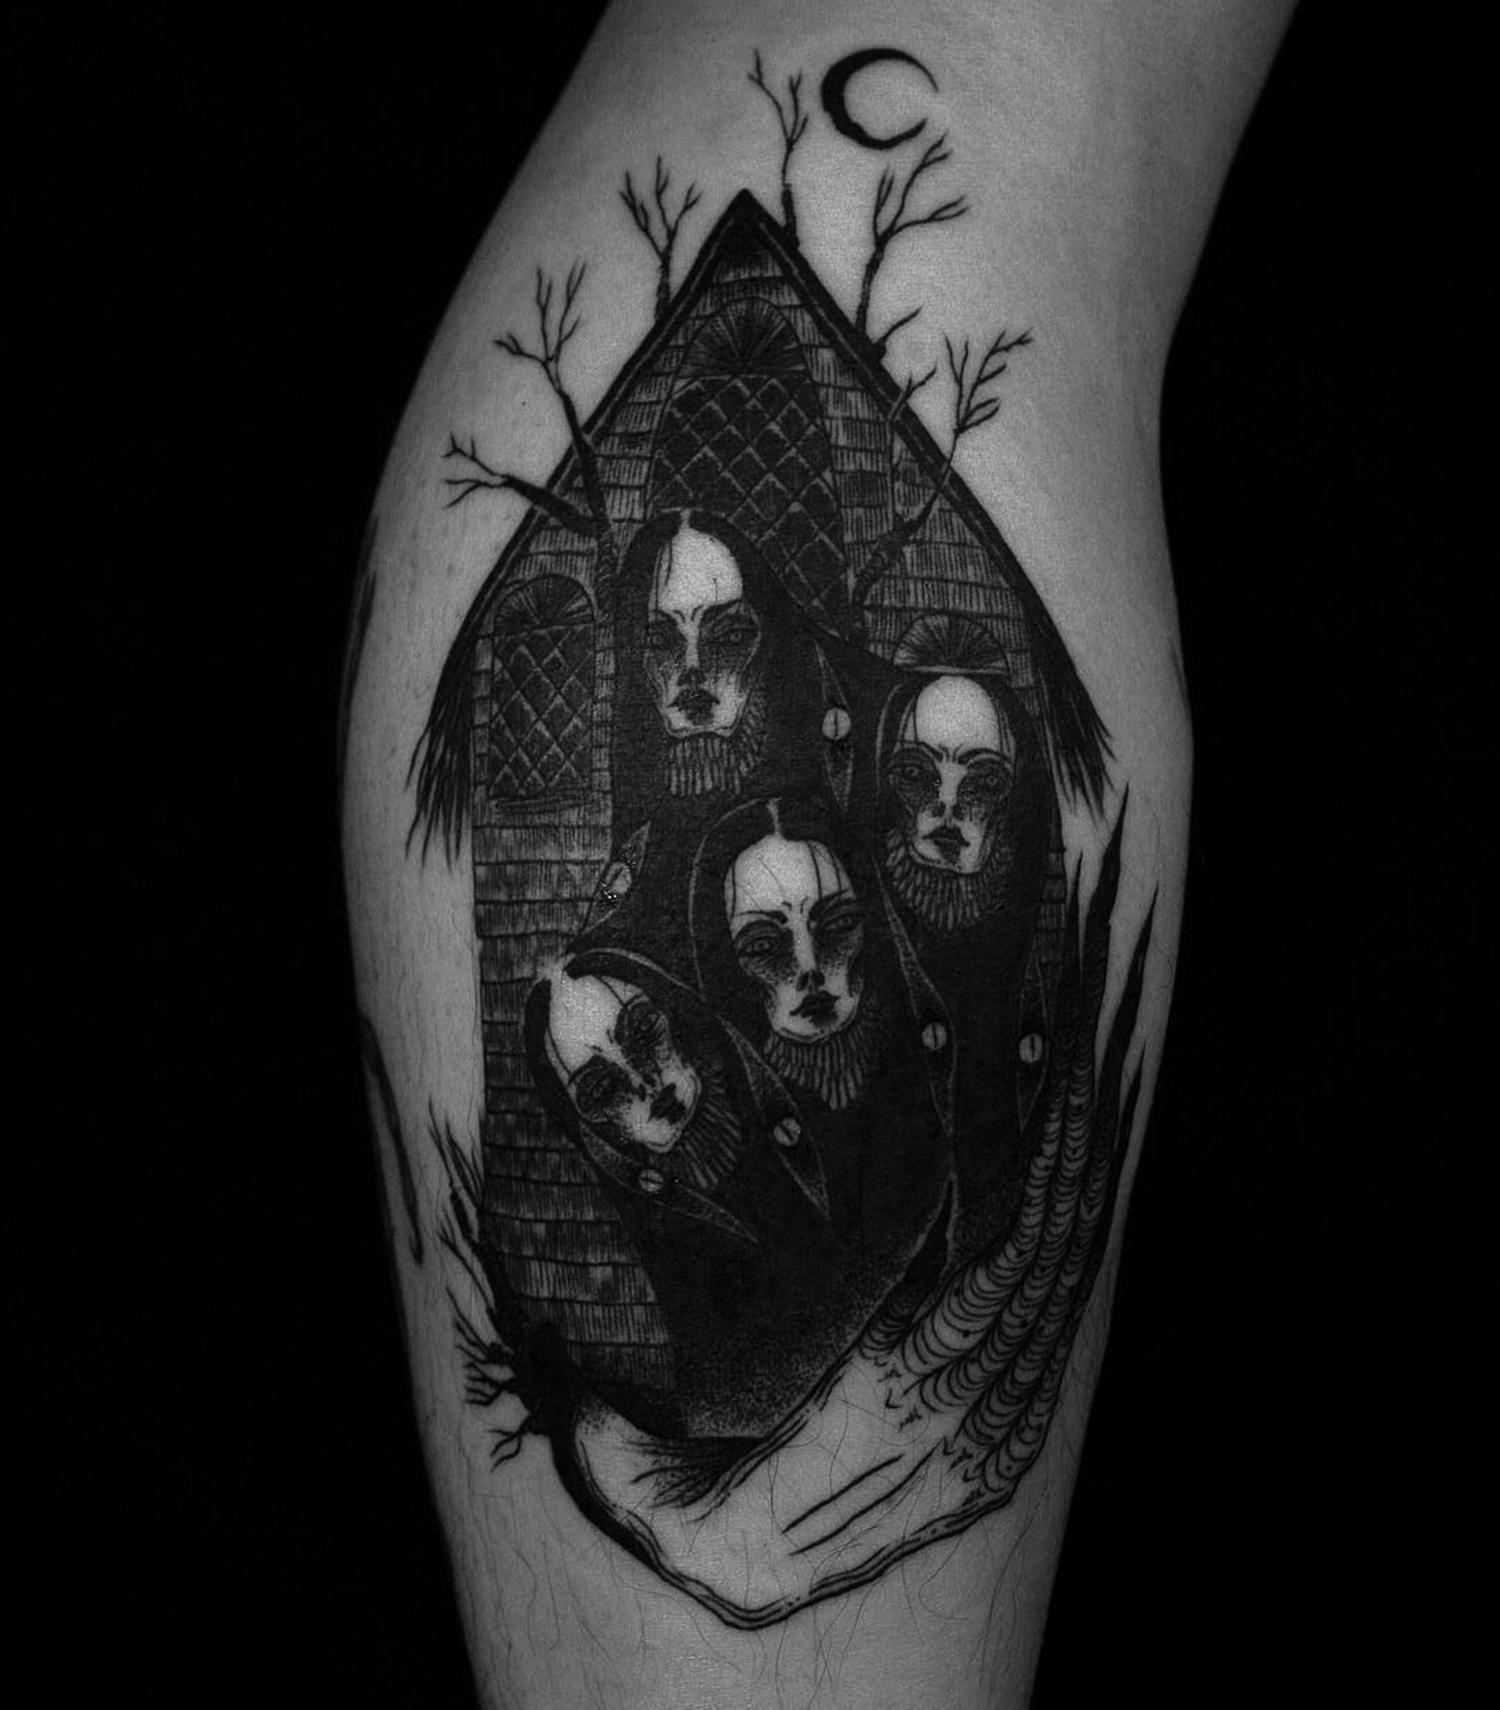 Suhwan Bak - Goth Gloomy tattoo - face house